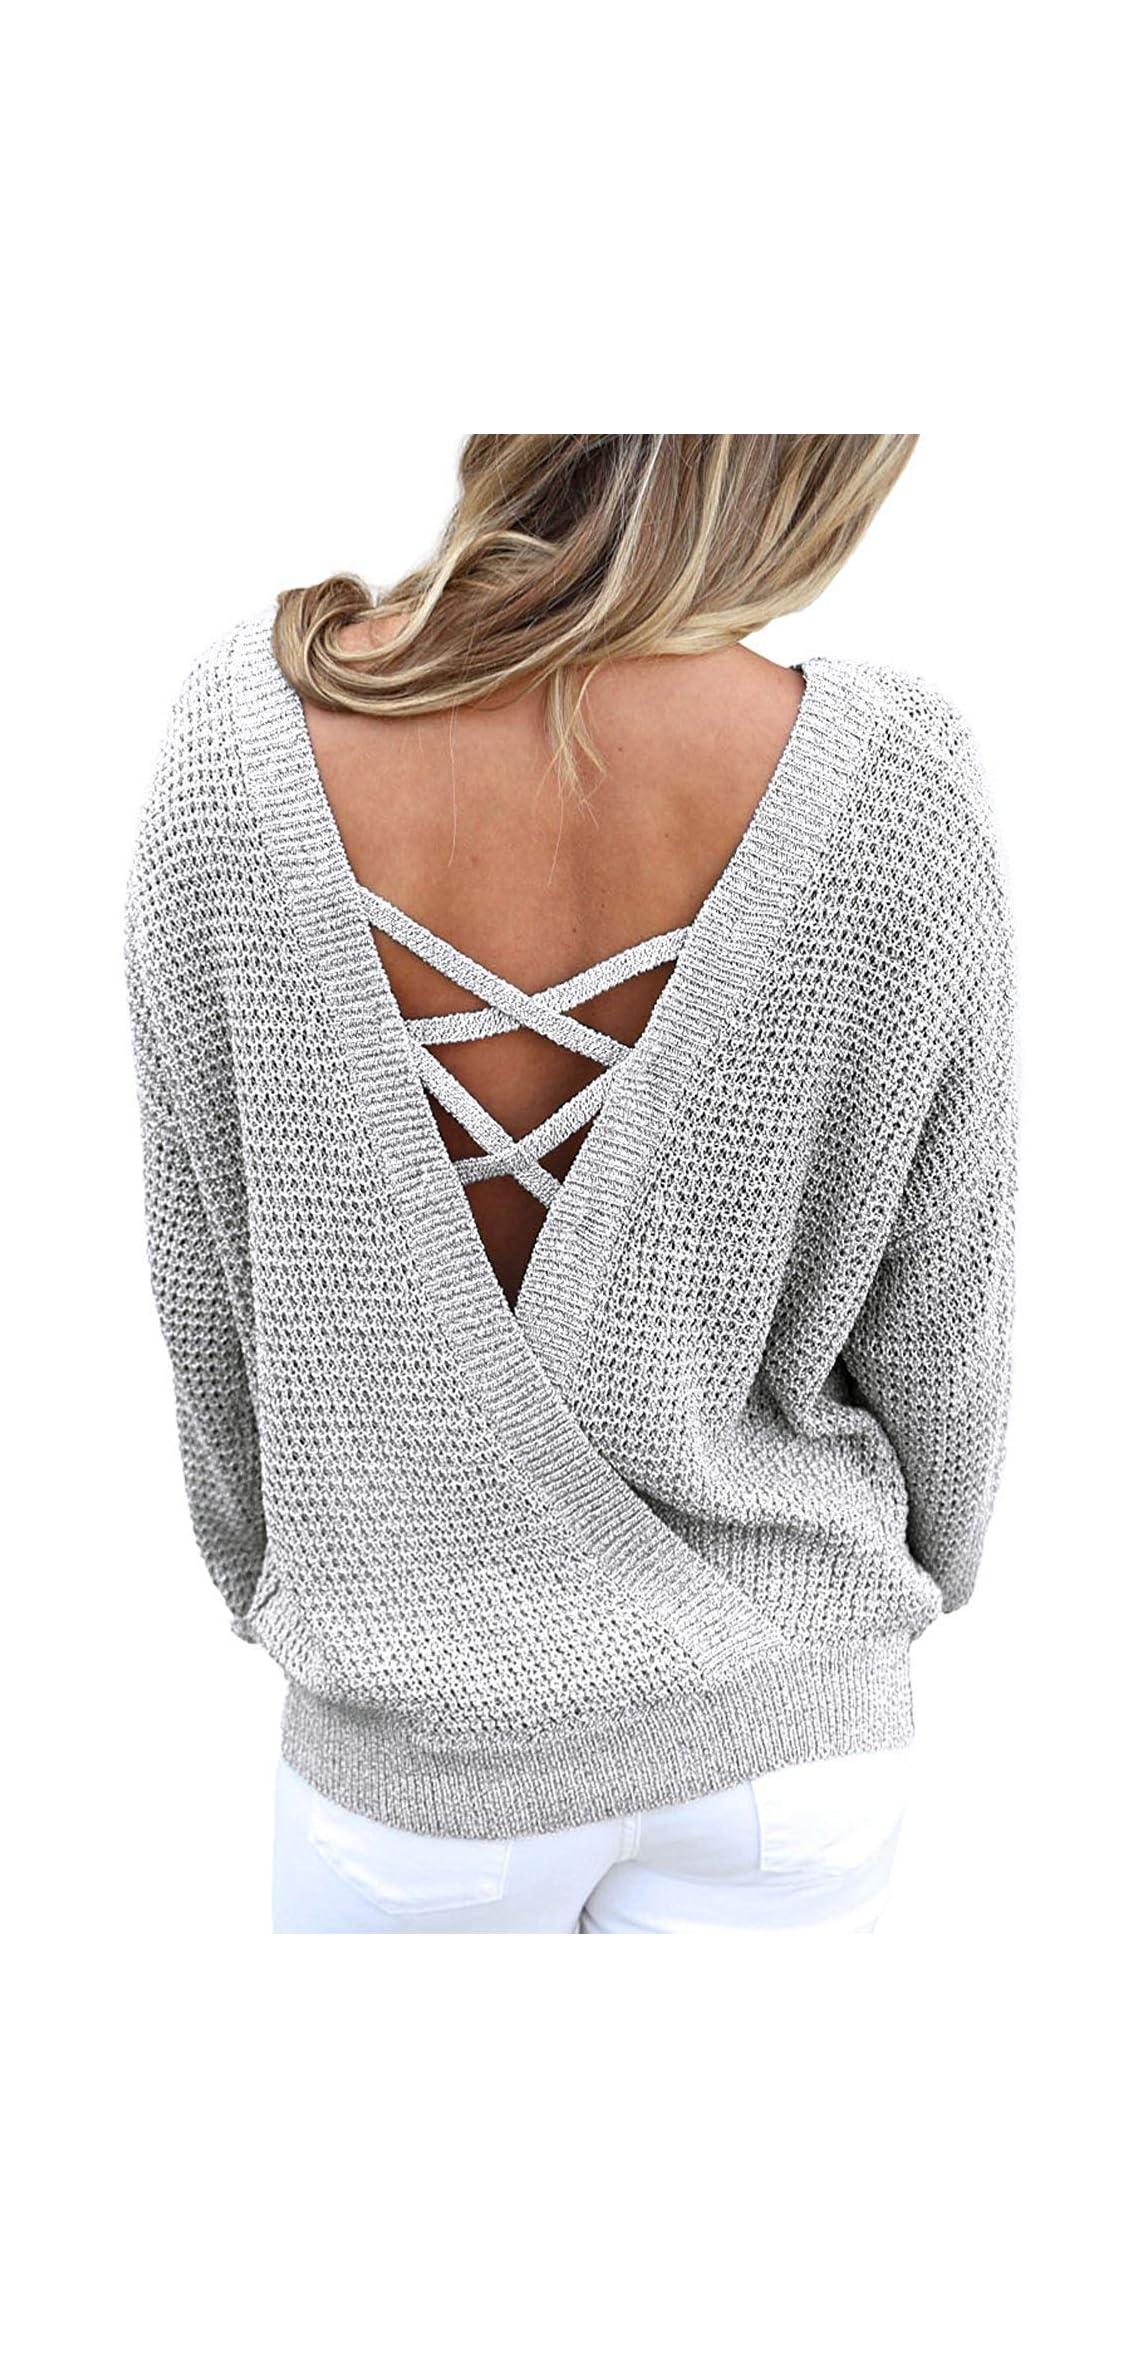 Women's Casual Long Sleeve Pullover Sweater Criss Cross